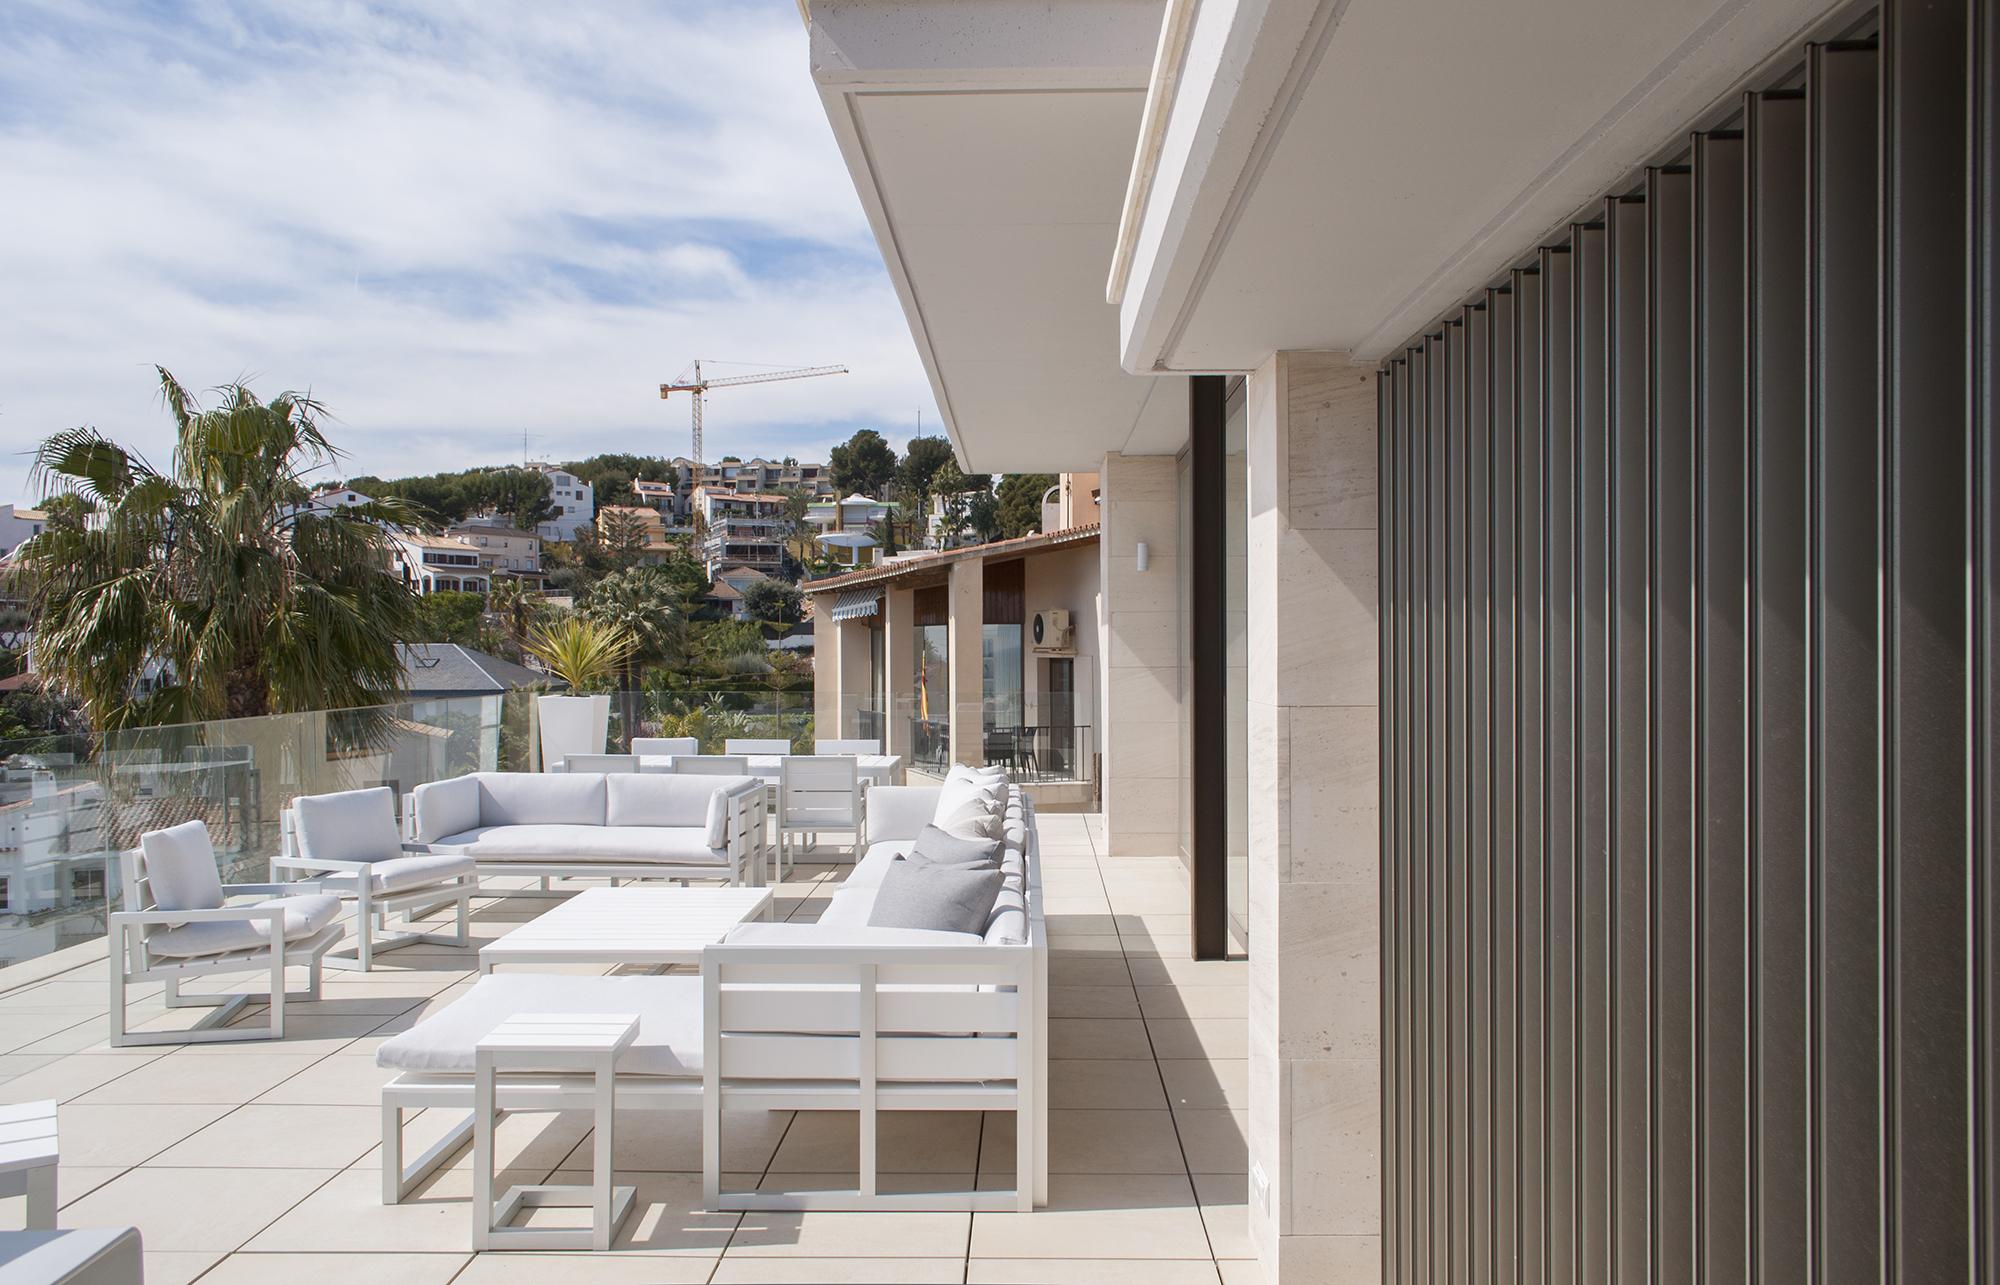 14-rardo-architects-casas-en-sitges-lamas-volumen-terraza